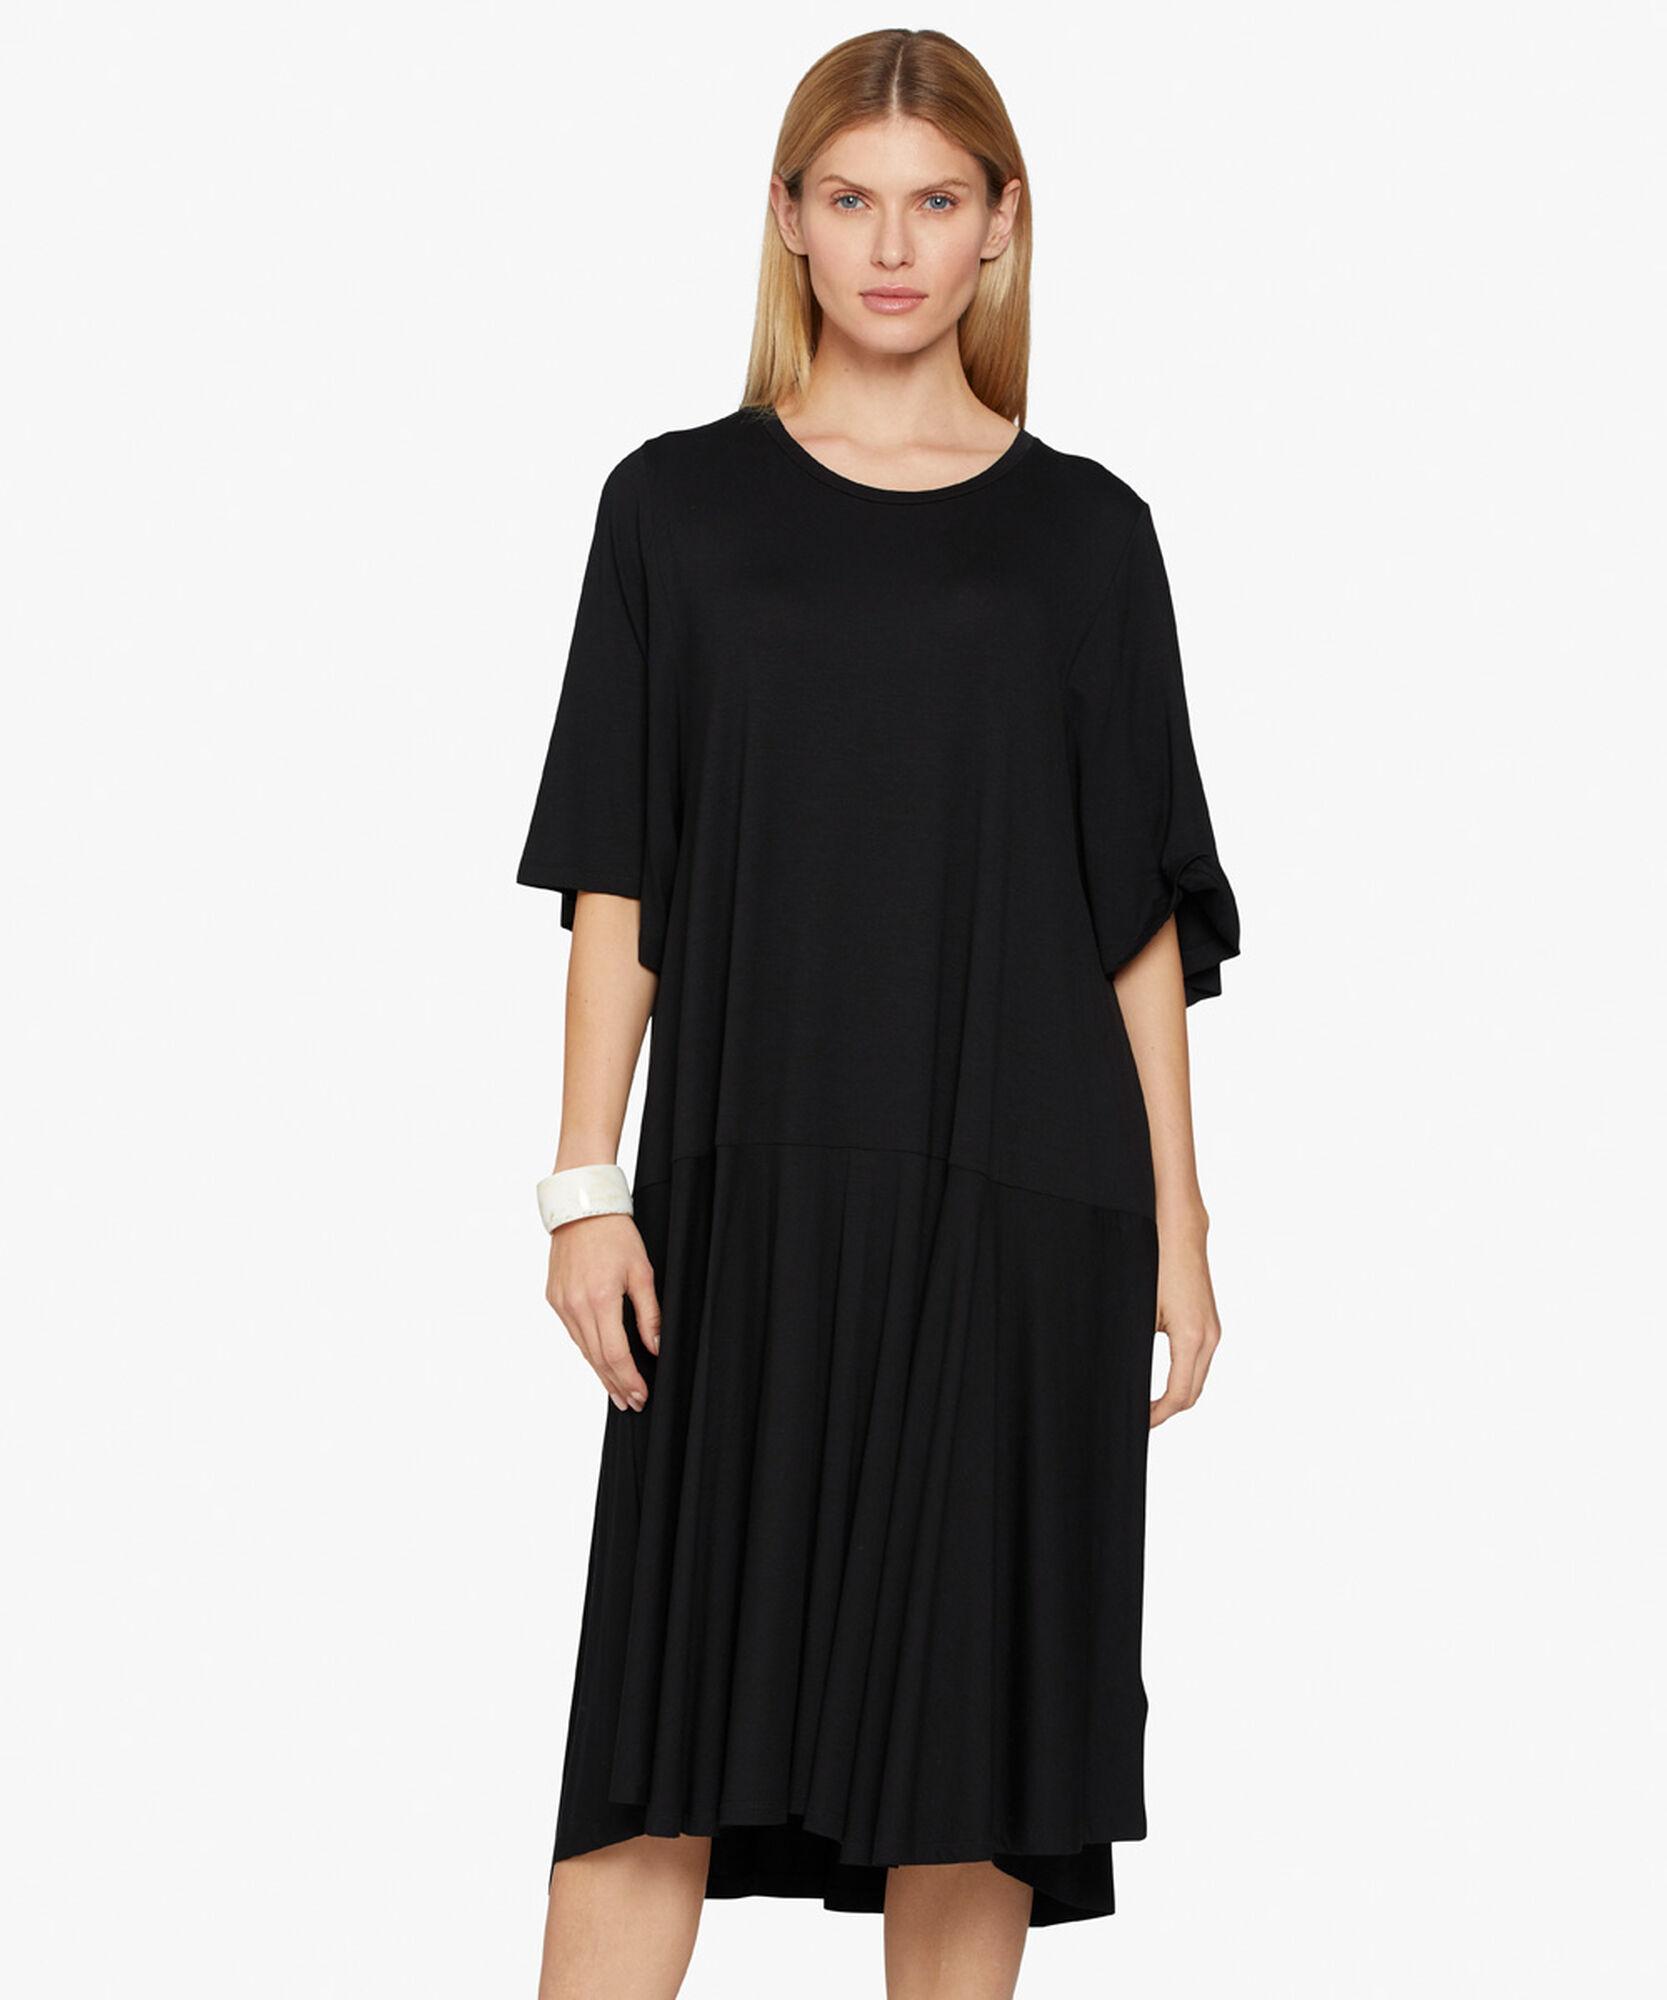 NESSANA DRESS, Black, hi-res